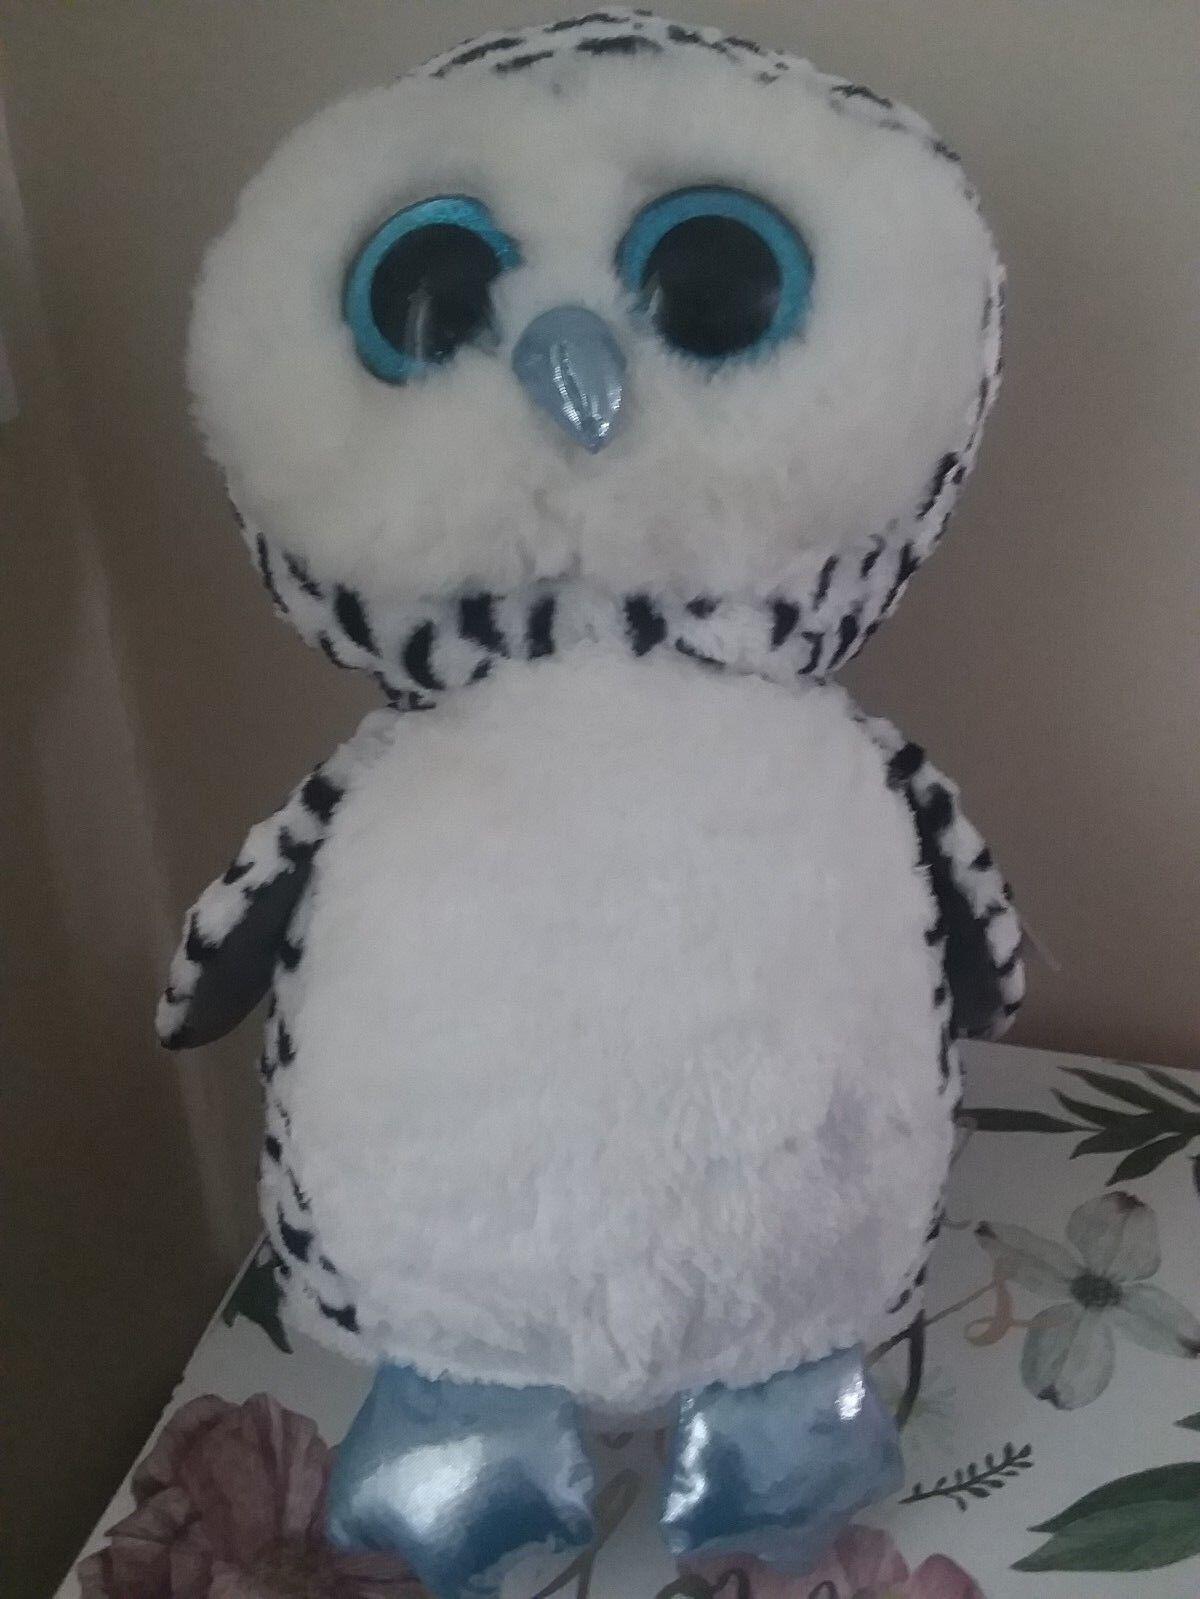 Ty mütze boos jumbo lucy owl.